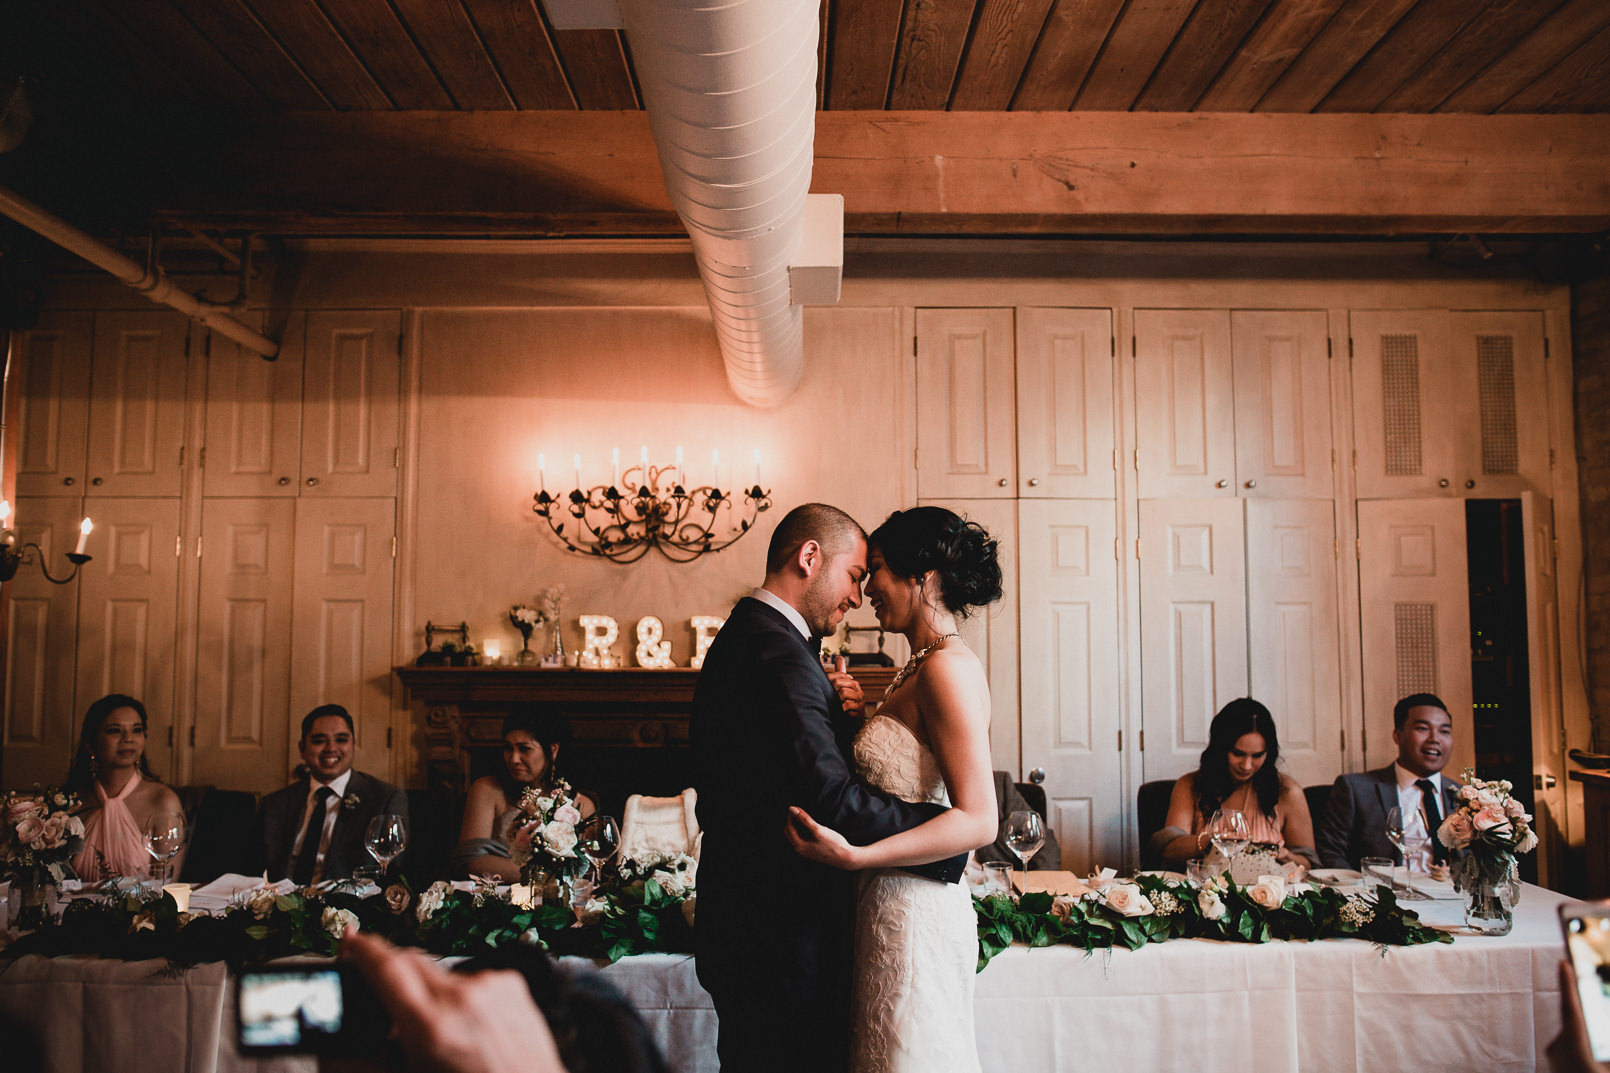 032-Jonathan-Kuhn-Photography-Wedding-_mini.jpg